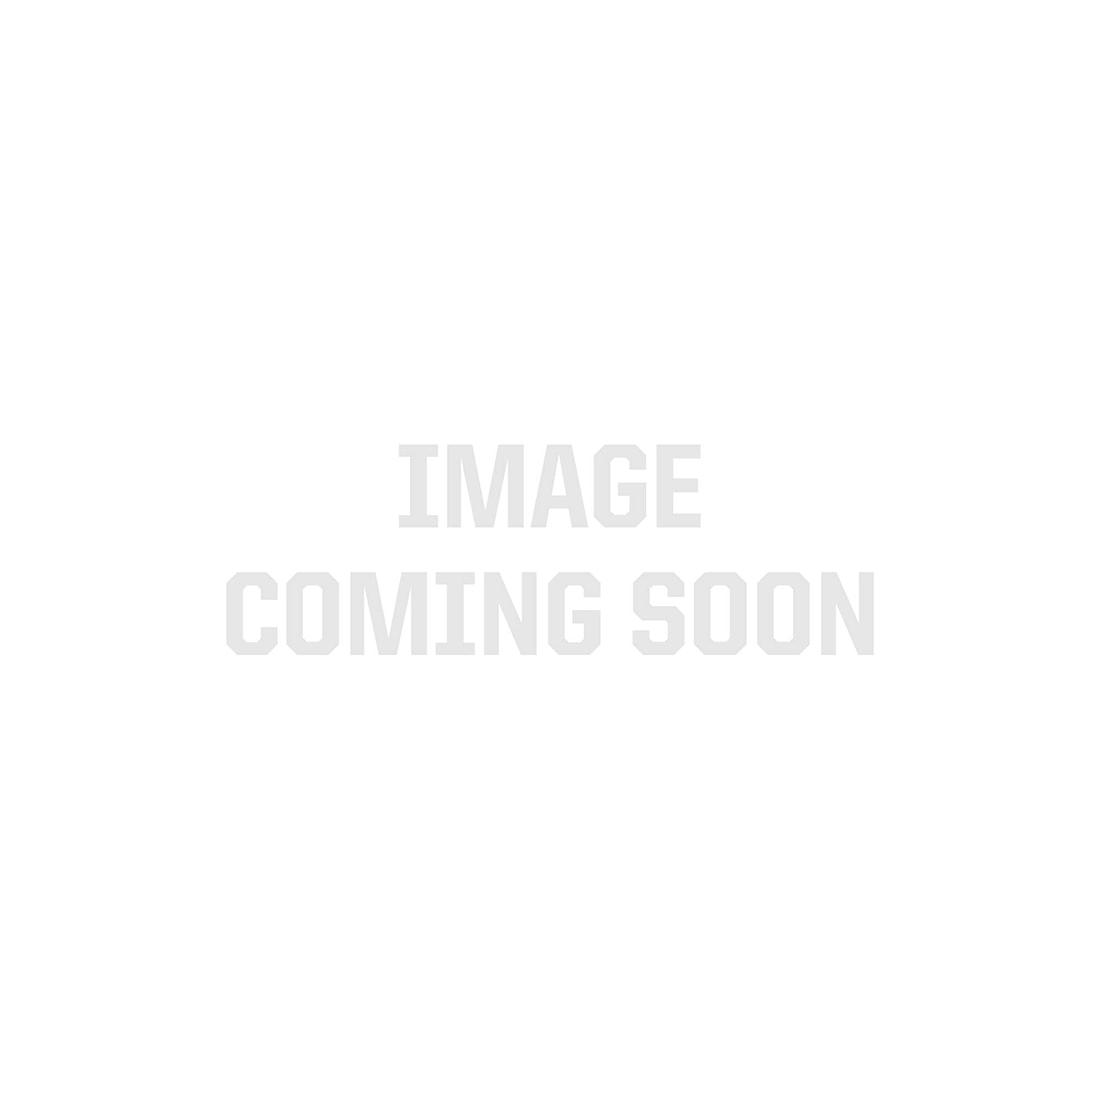 Red 3528 Quad Row LED Strip Light, 450/m, 28mm wide, Sample Kit